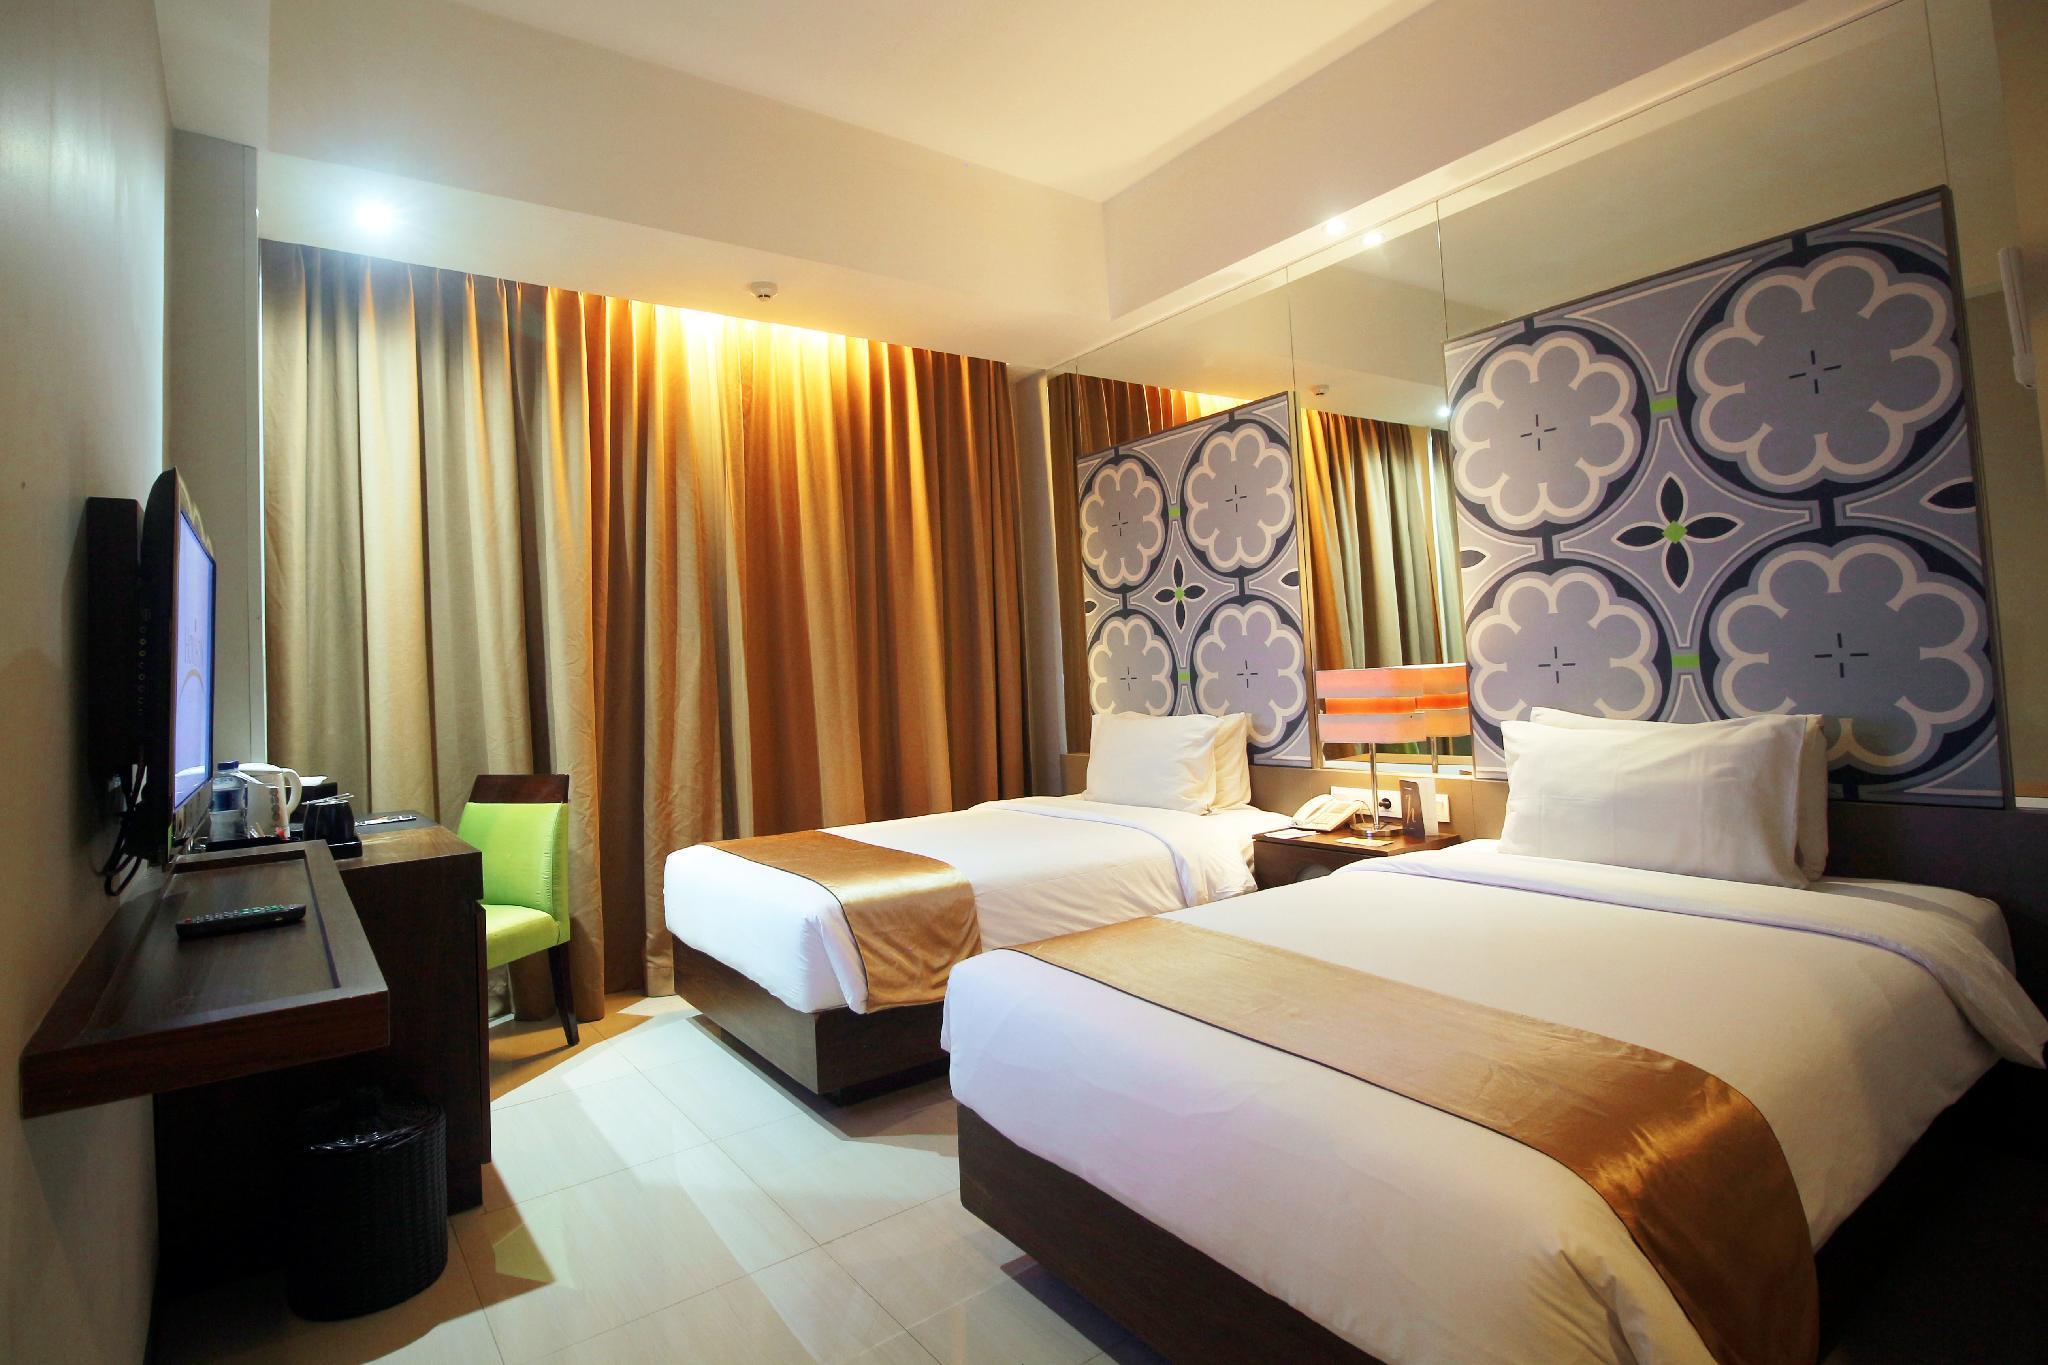 Horison Pekalongan Hotel Booking Deals 2019 Promos